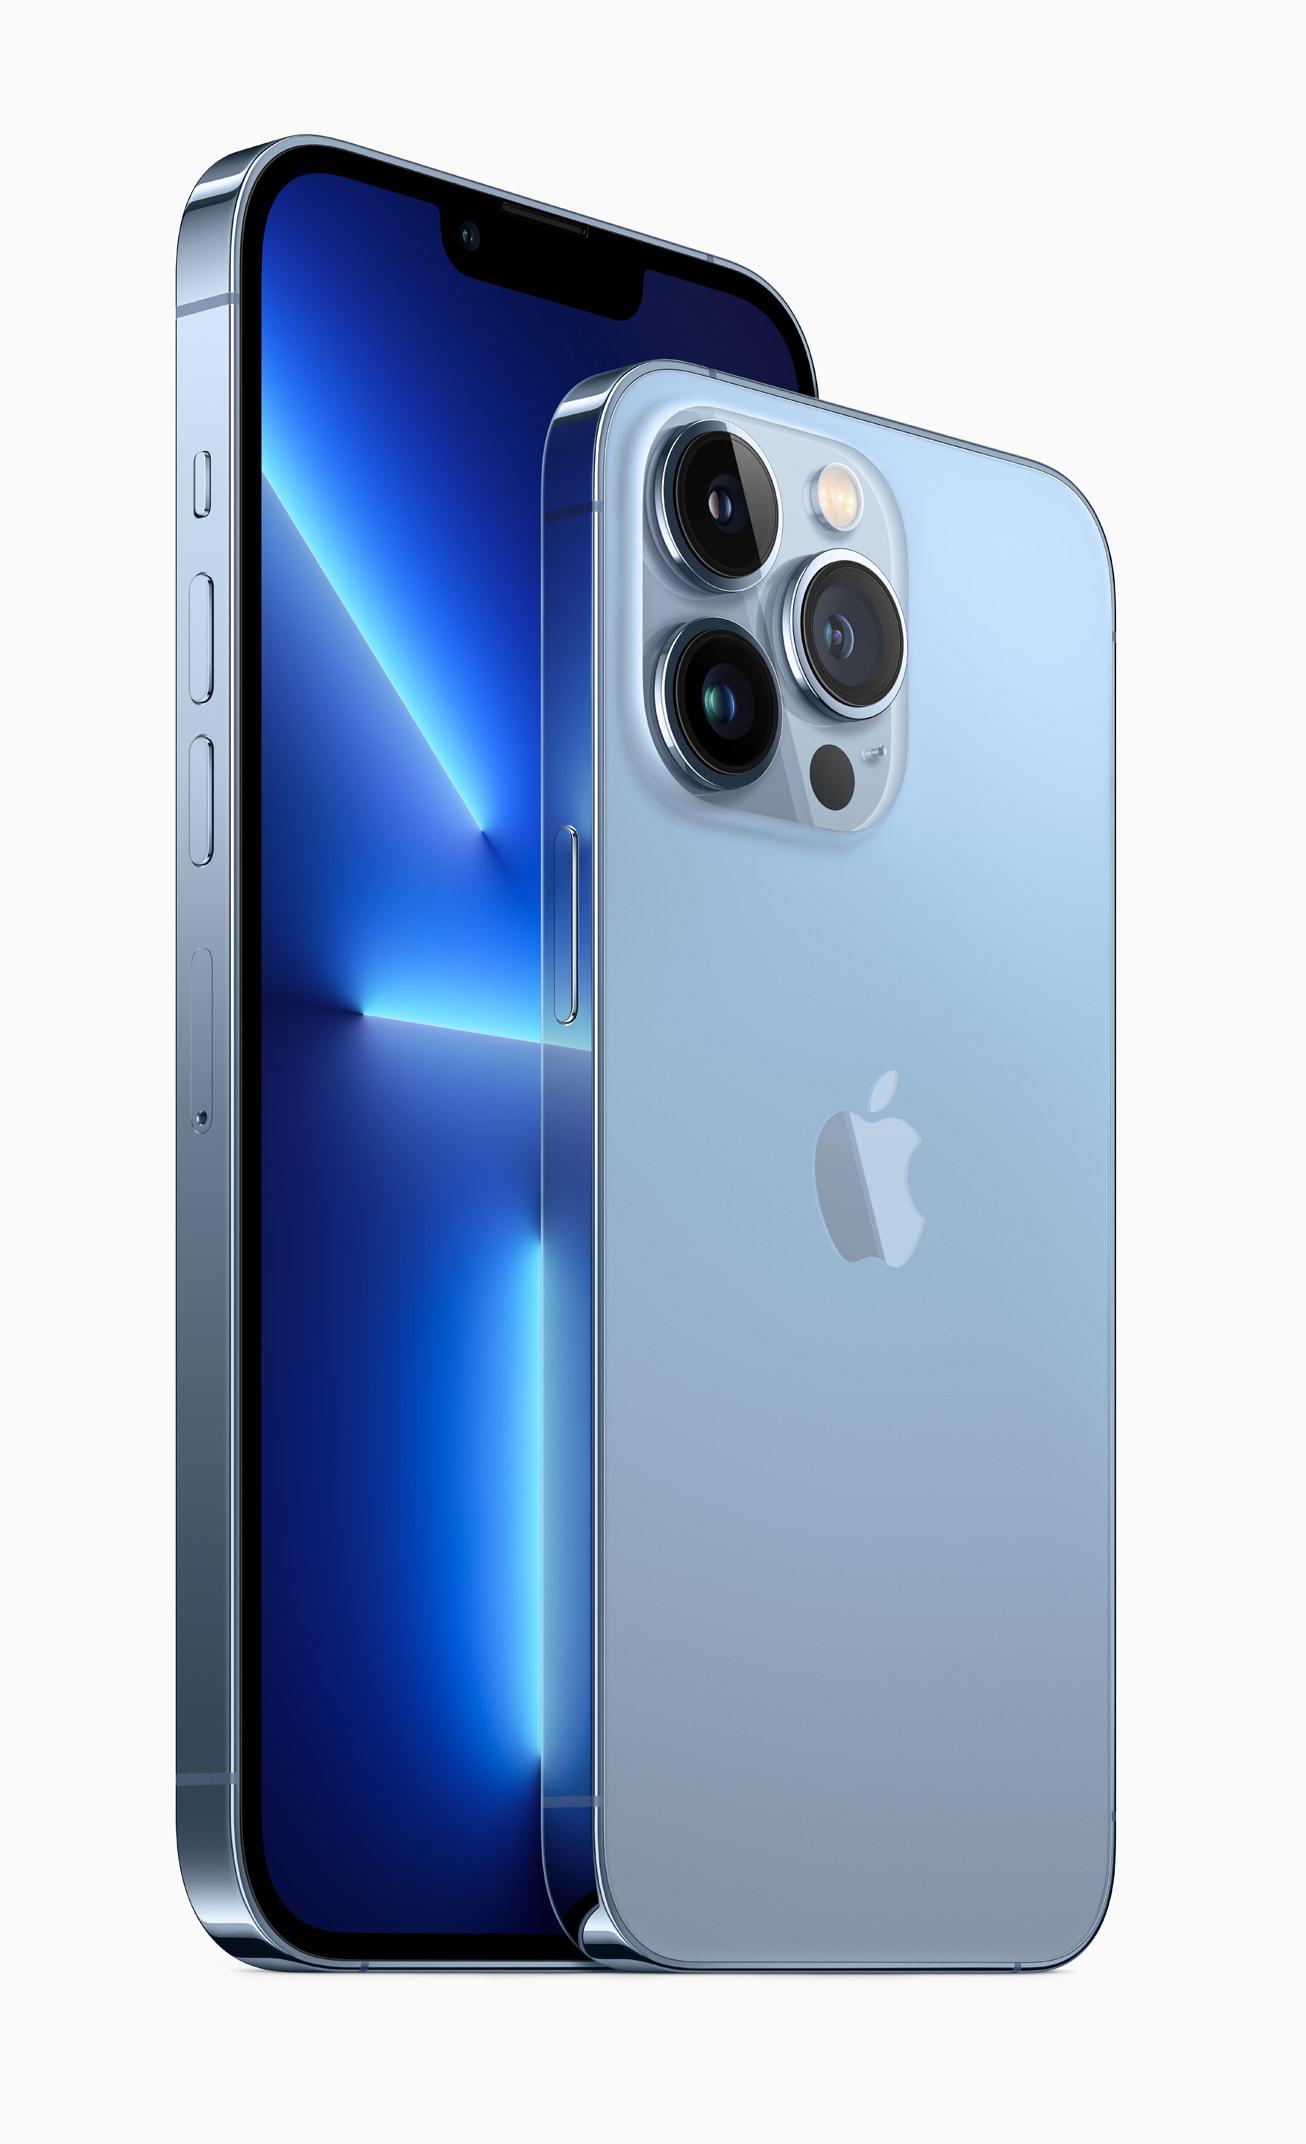 iPhone 13 Pro & iPhone 13 Pro Max